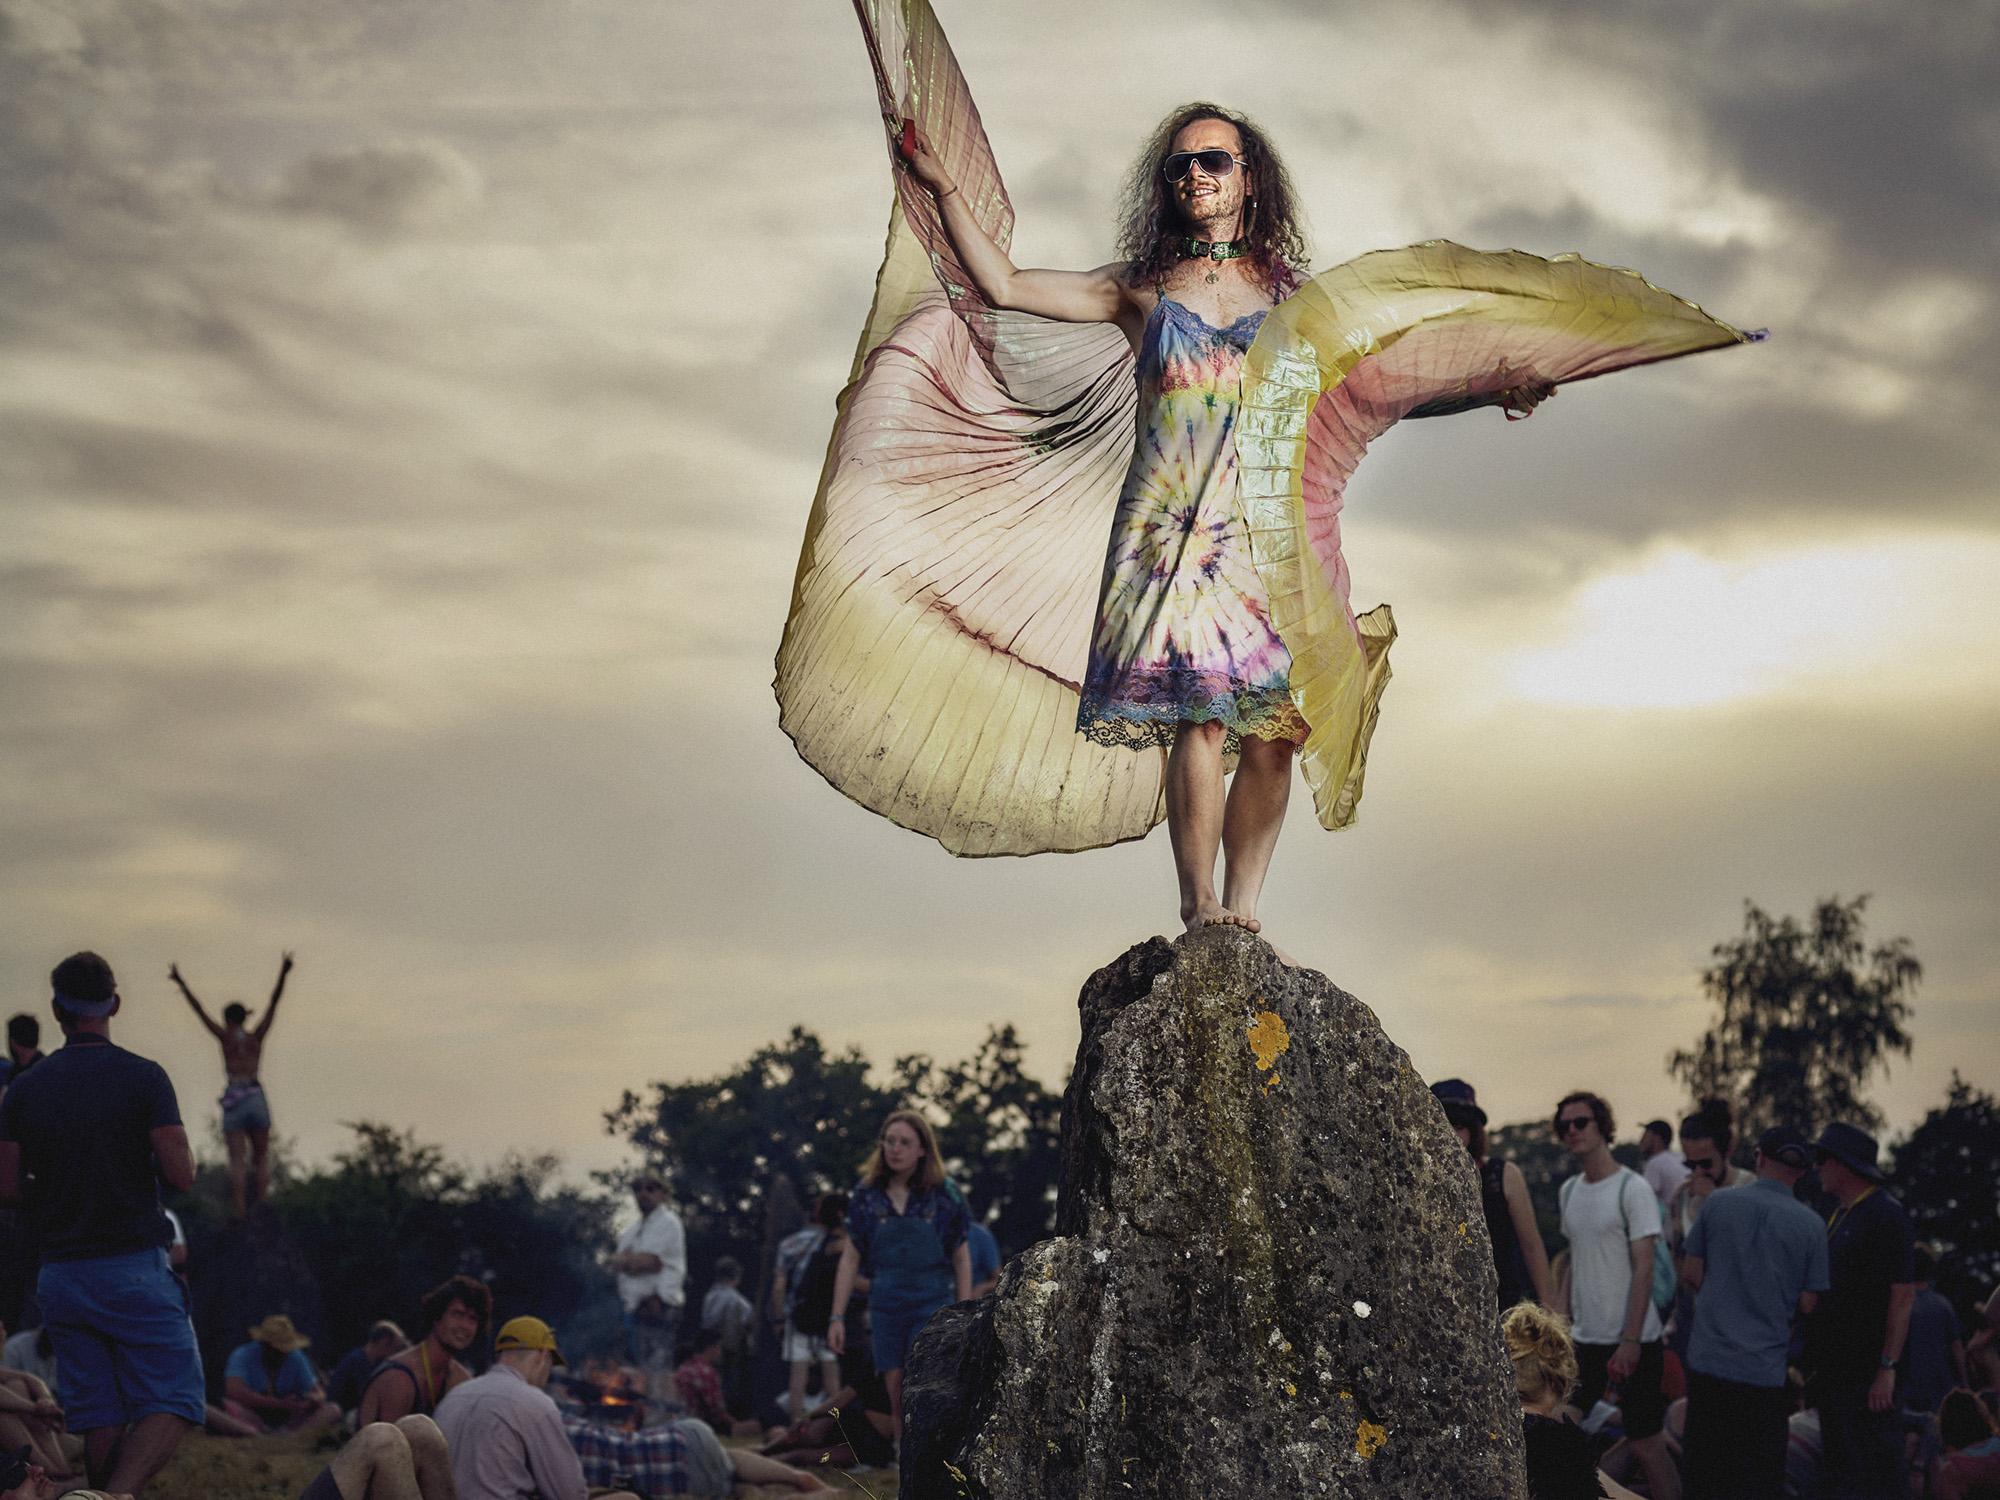 Bertram - a stone circle angel on Summer Solstice